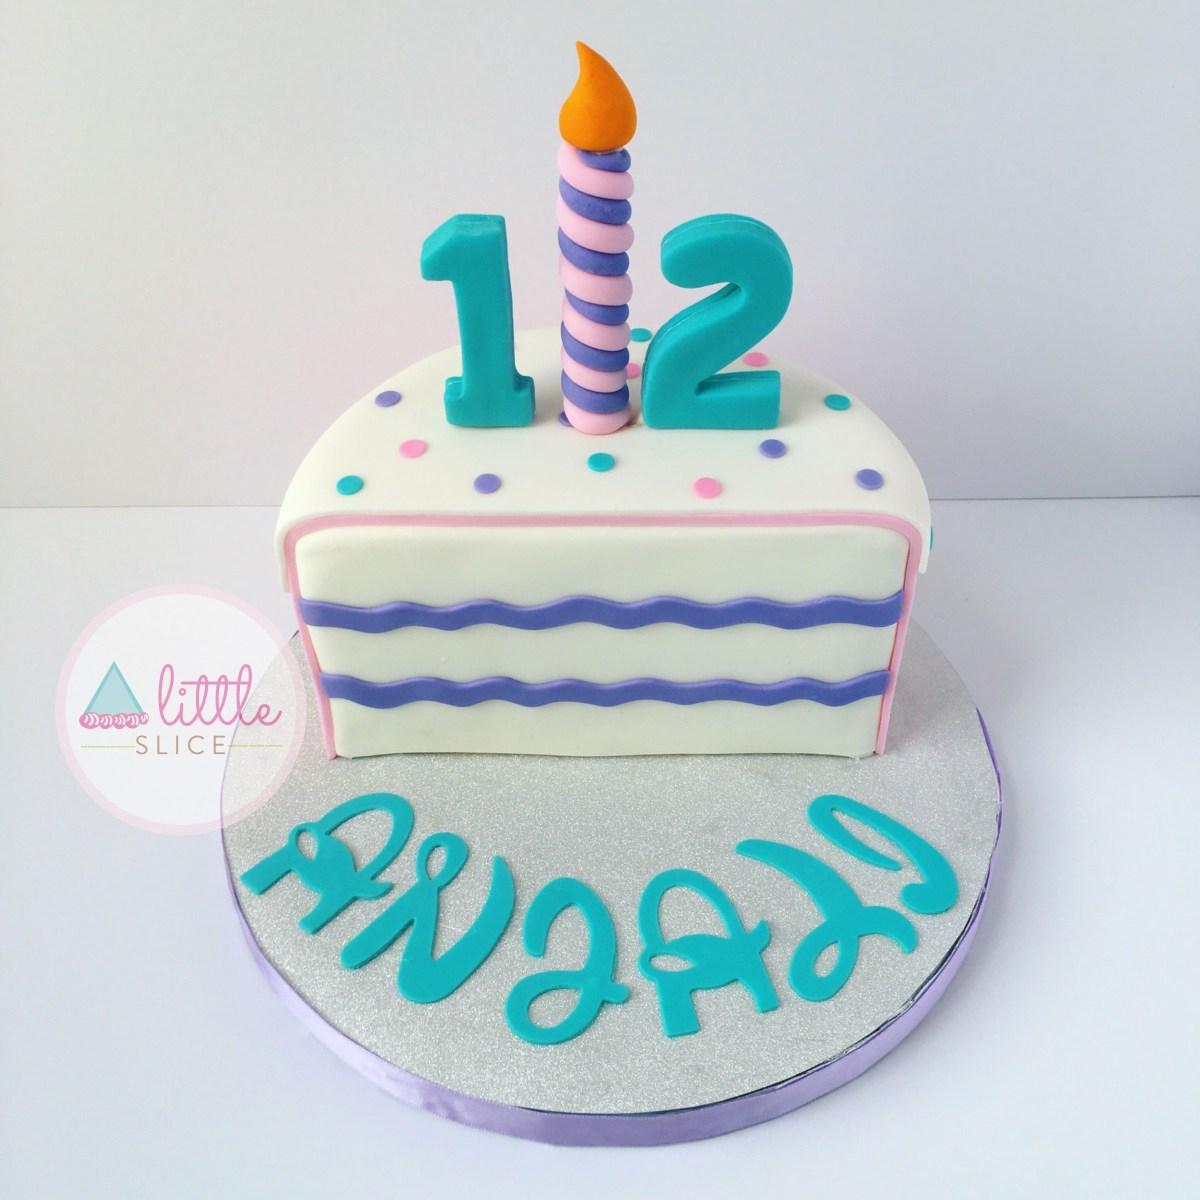 6 Month Birthday Cake 12 Birthday Cake 6 Months Cake Follow Us On Instagram